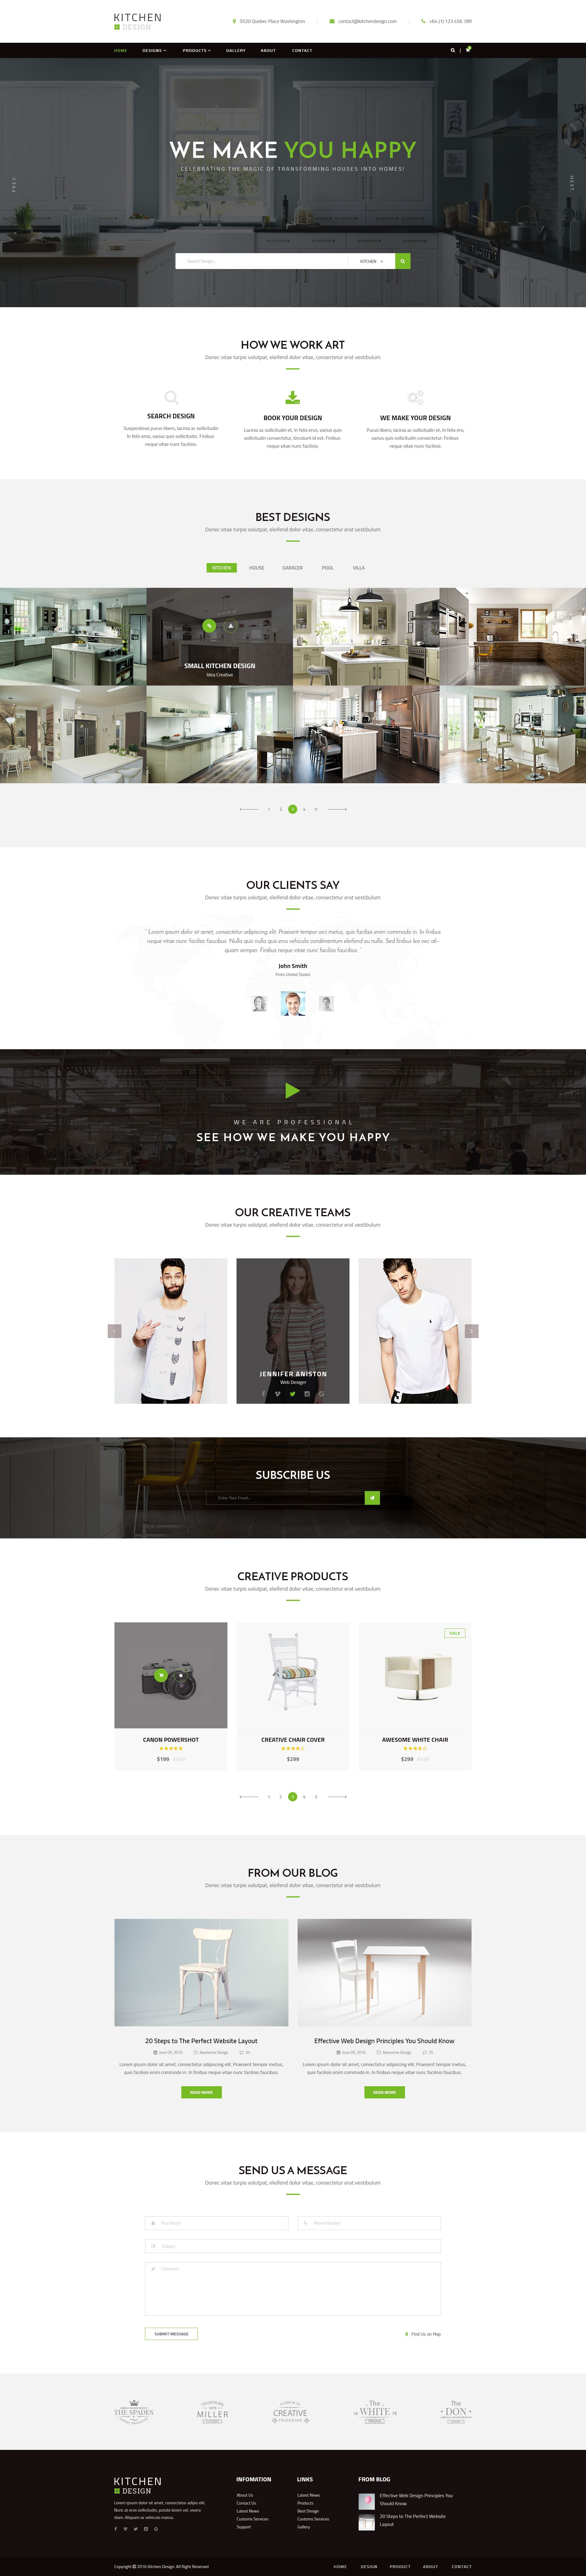 Kitchen   PSD Template   Psd templates, Interior design website ...